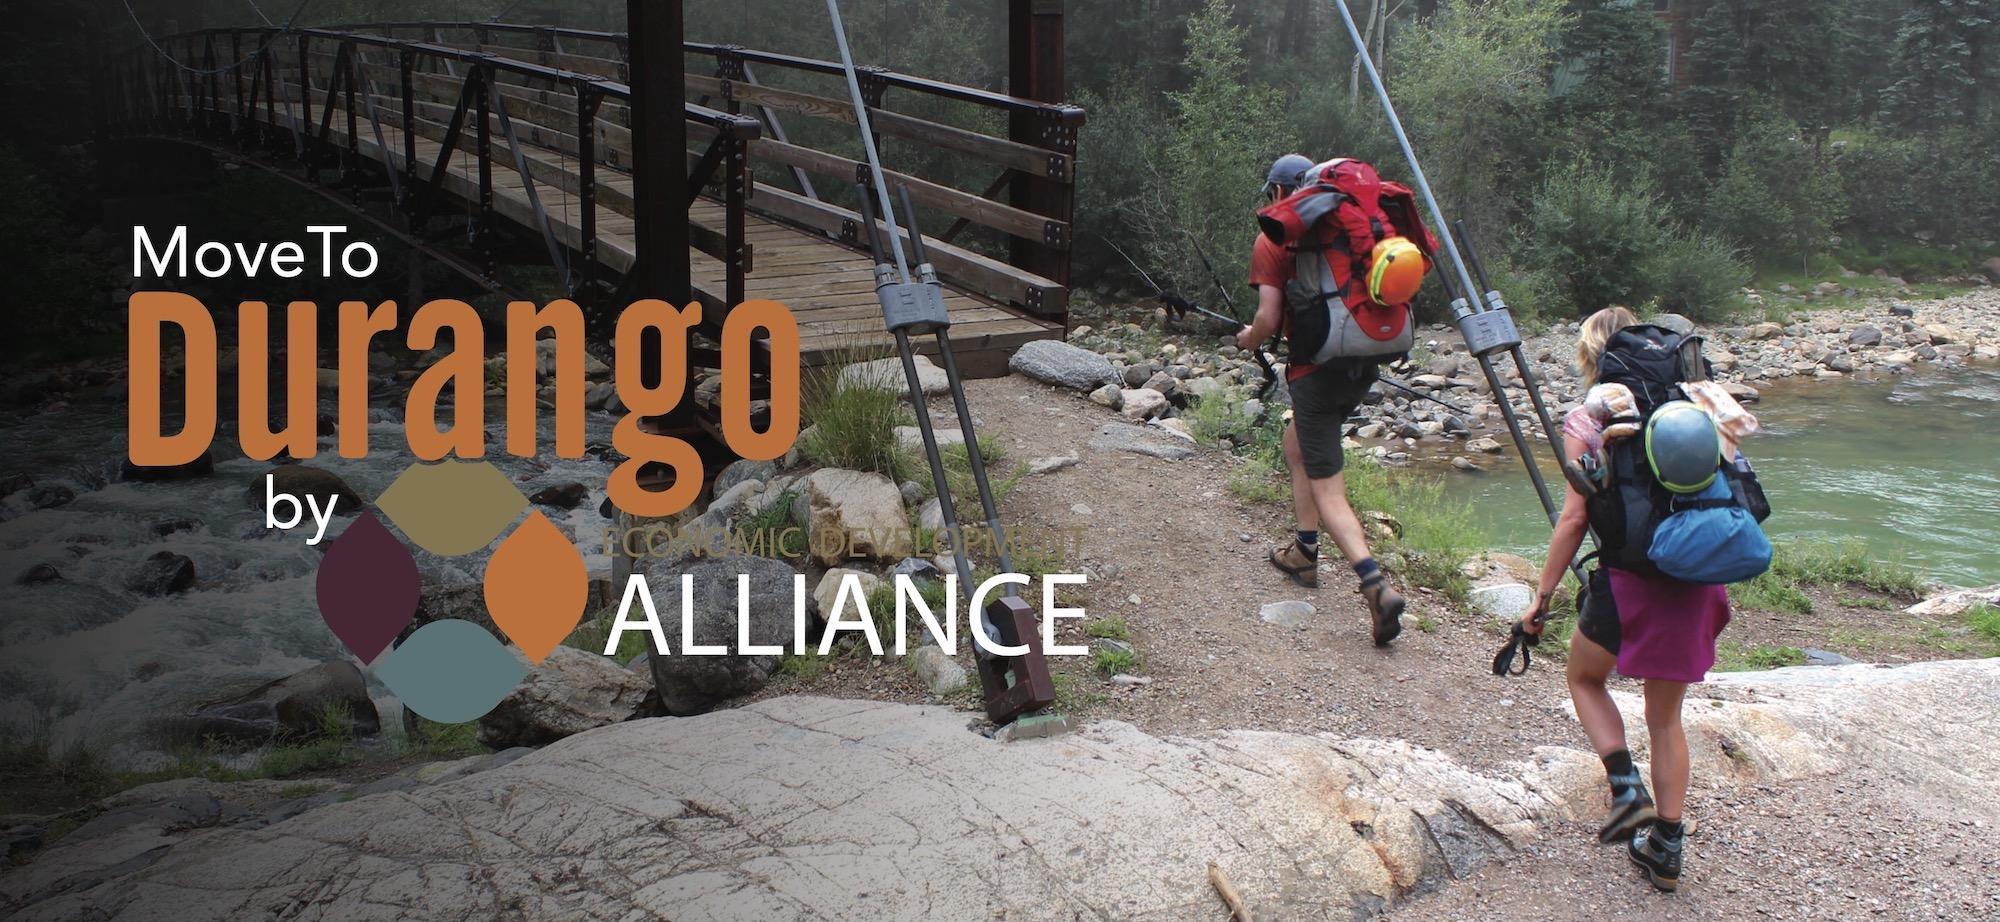 Move to Durango by the Economic Development Alliance